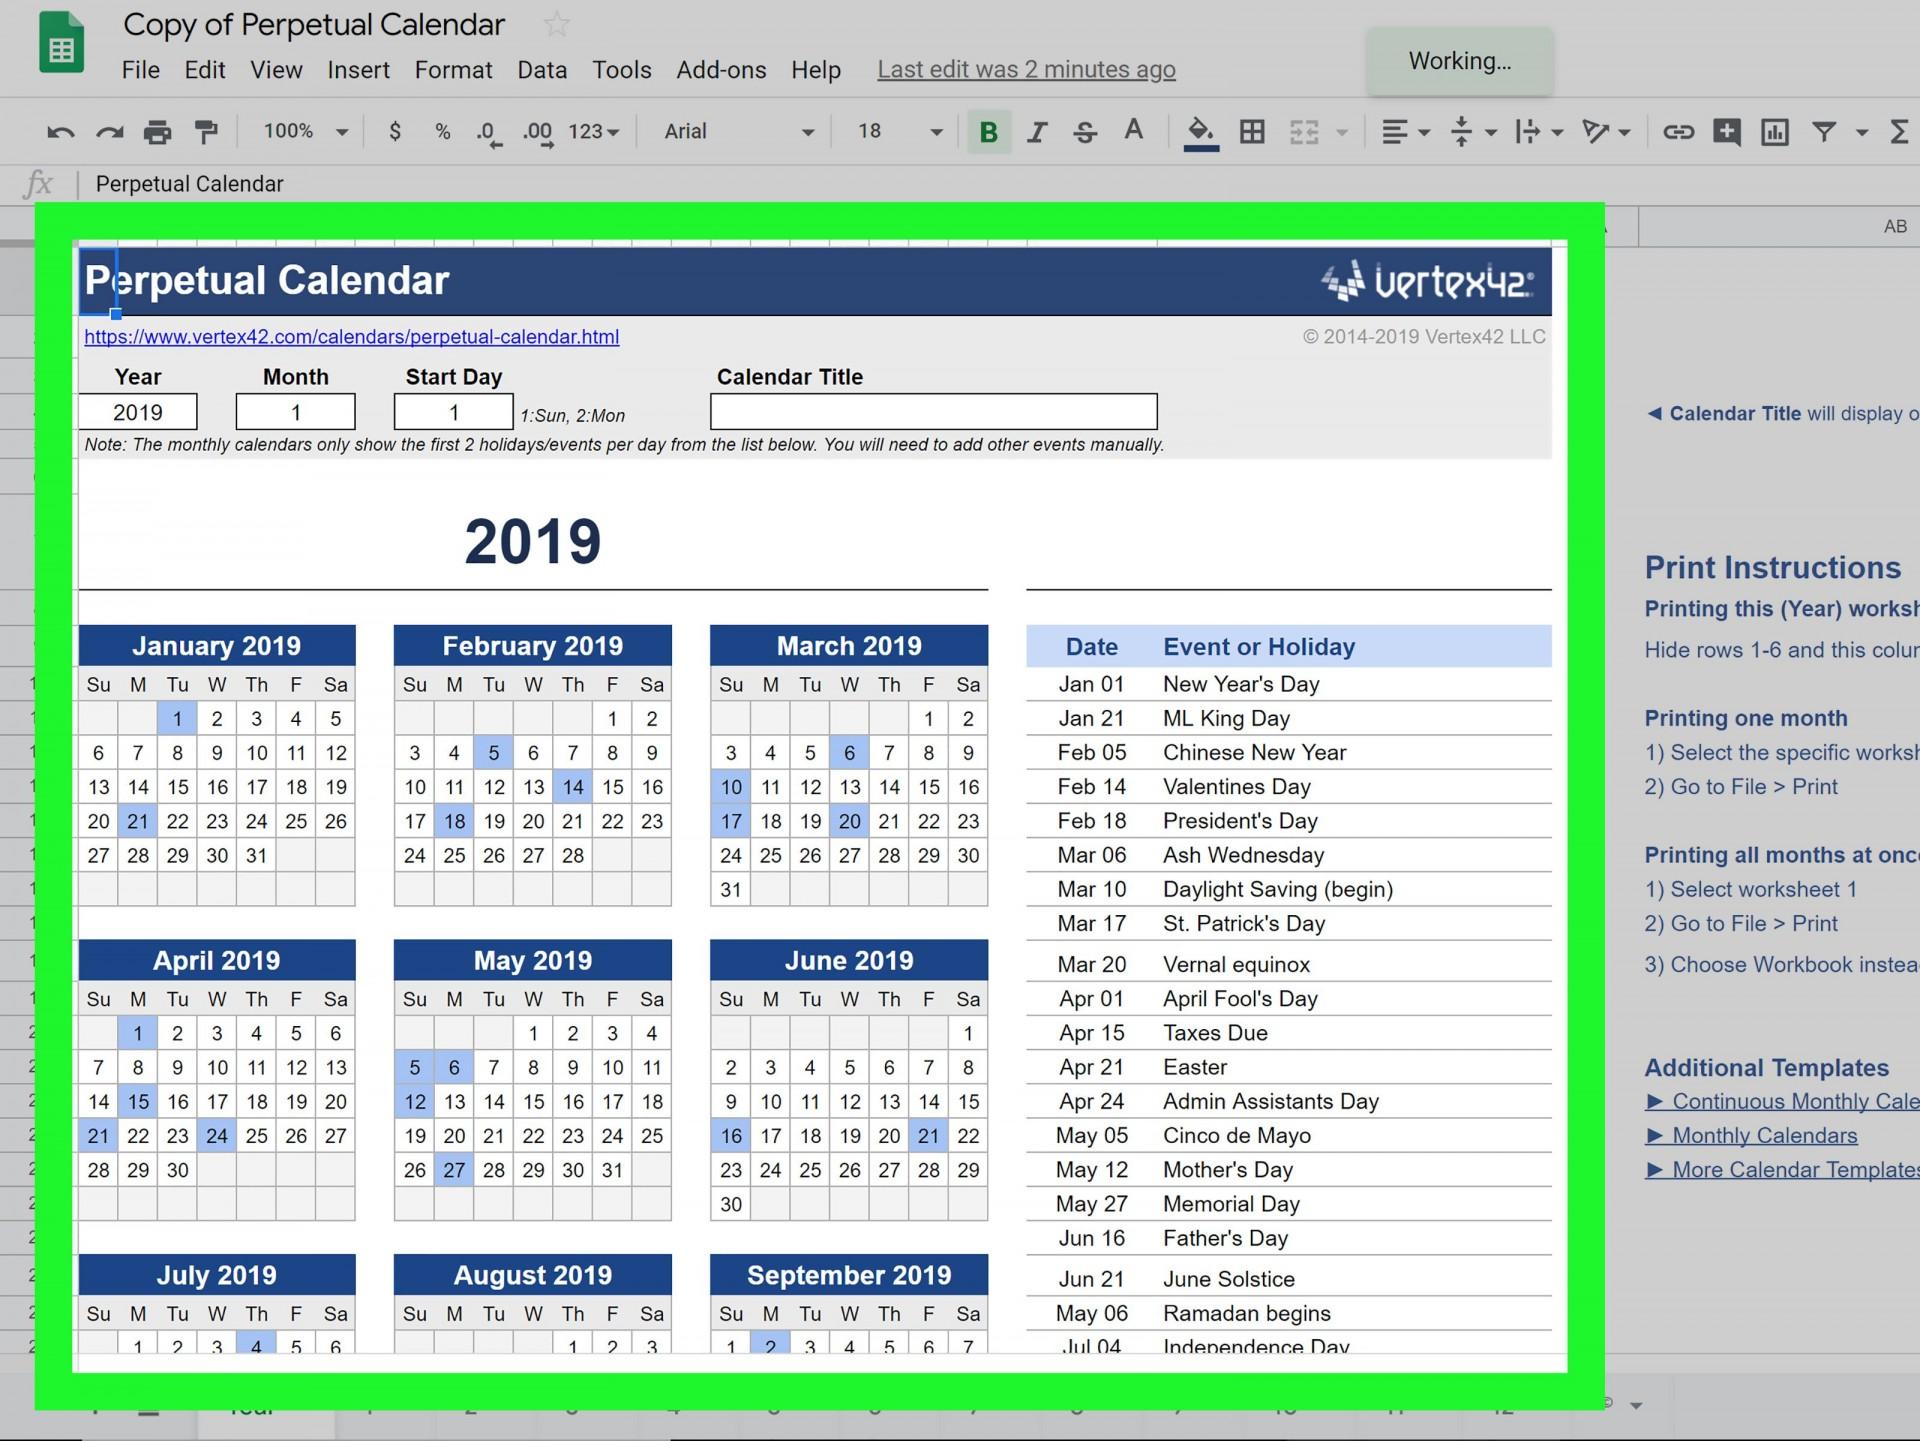 003 Wonderful Calendar Template Google Doc Idea  Docs Editable Two Week 2019-201920